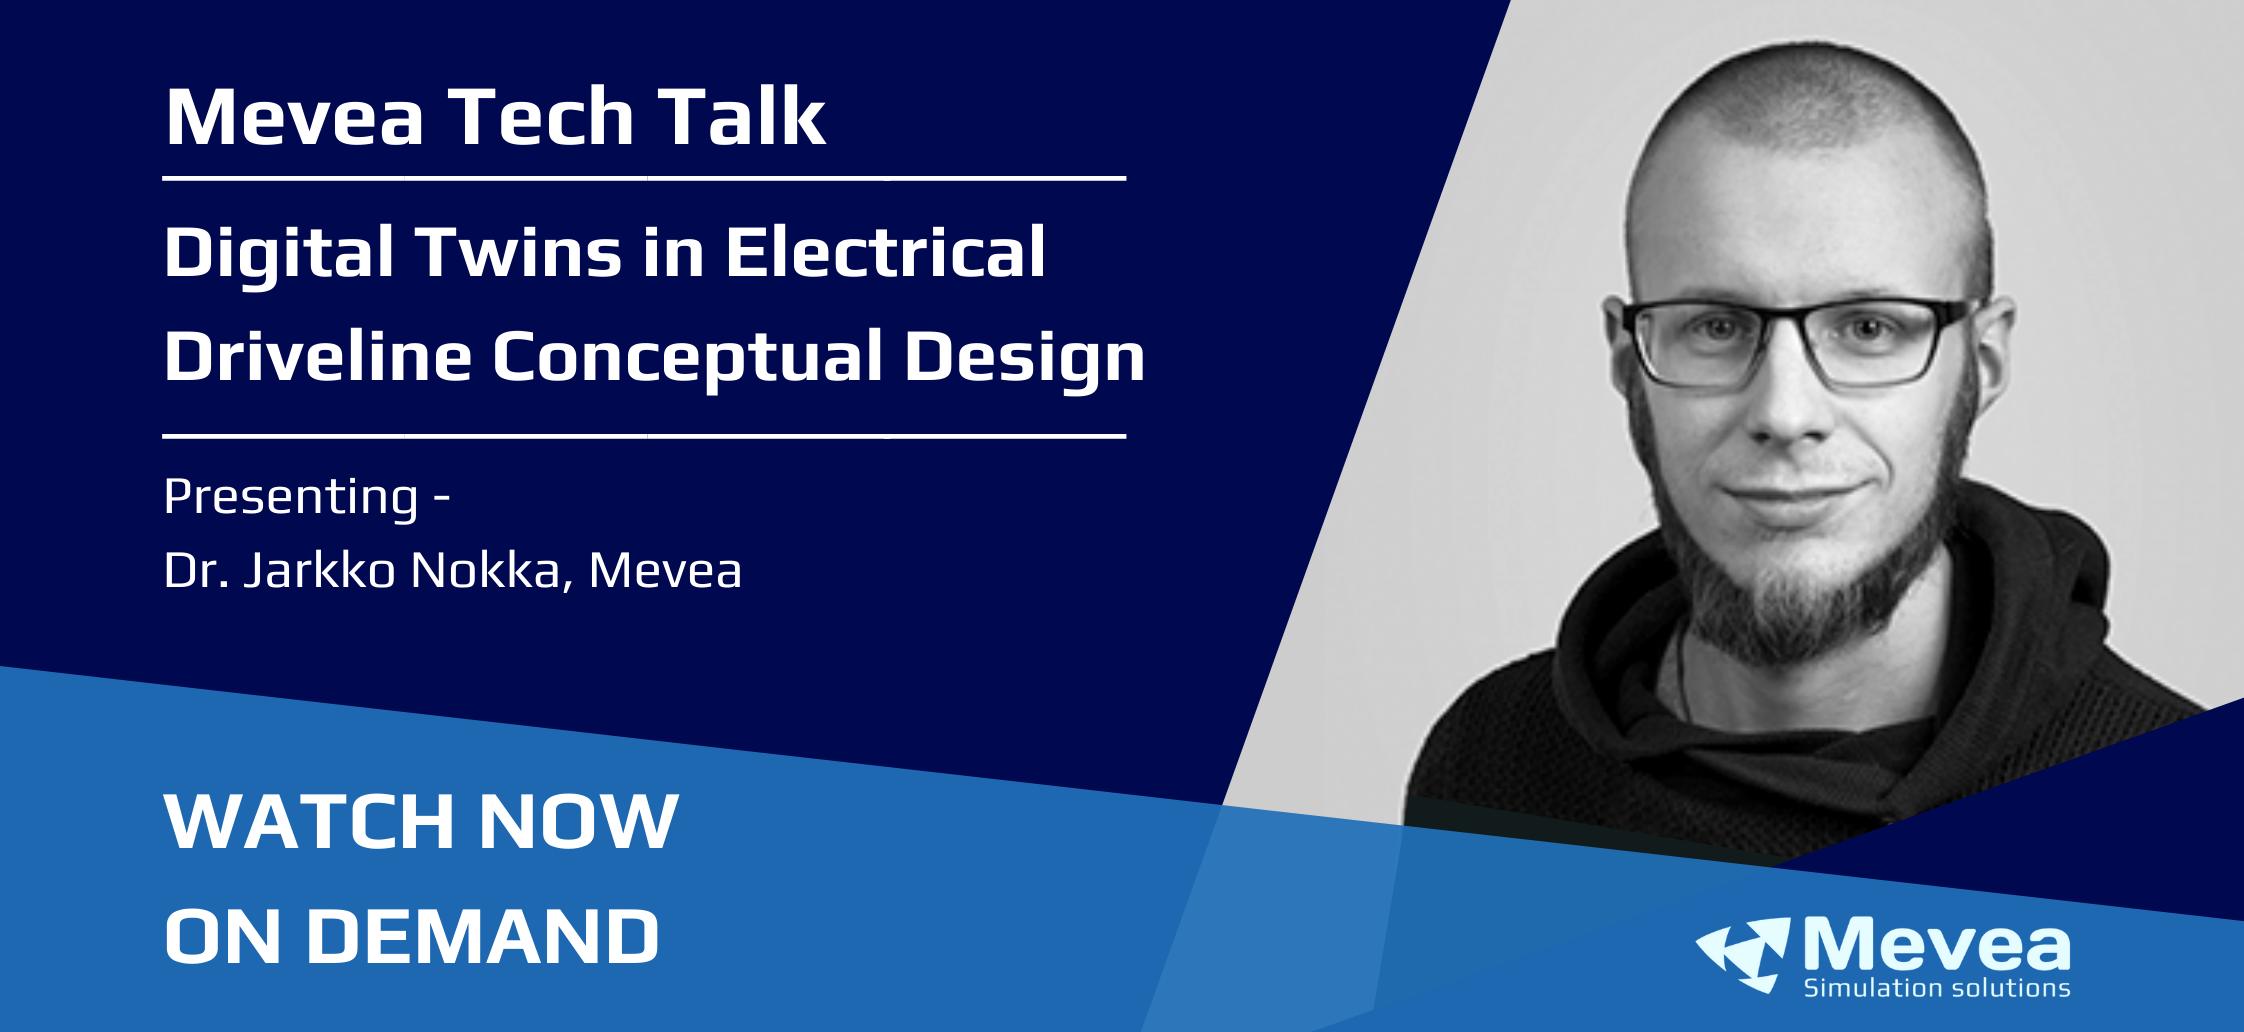 Tech Talk – Digital Twins in Electrical Driveline Conceptual Design